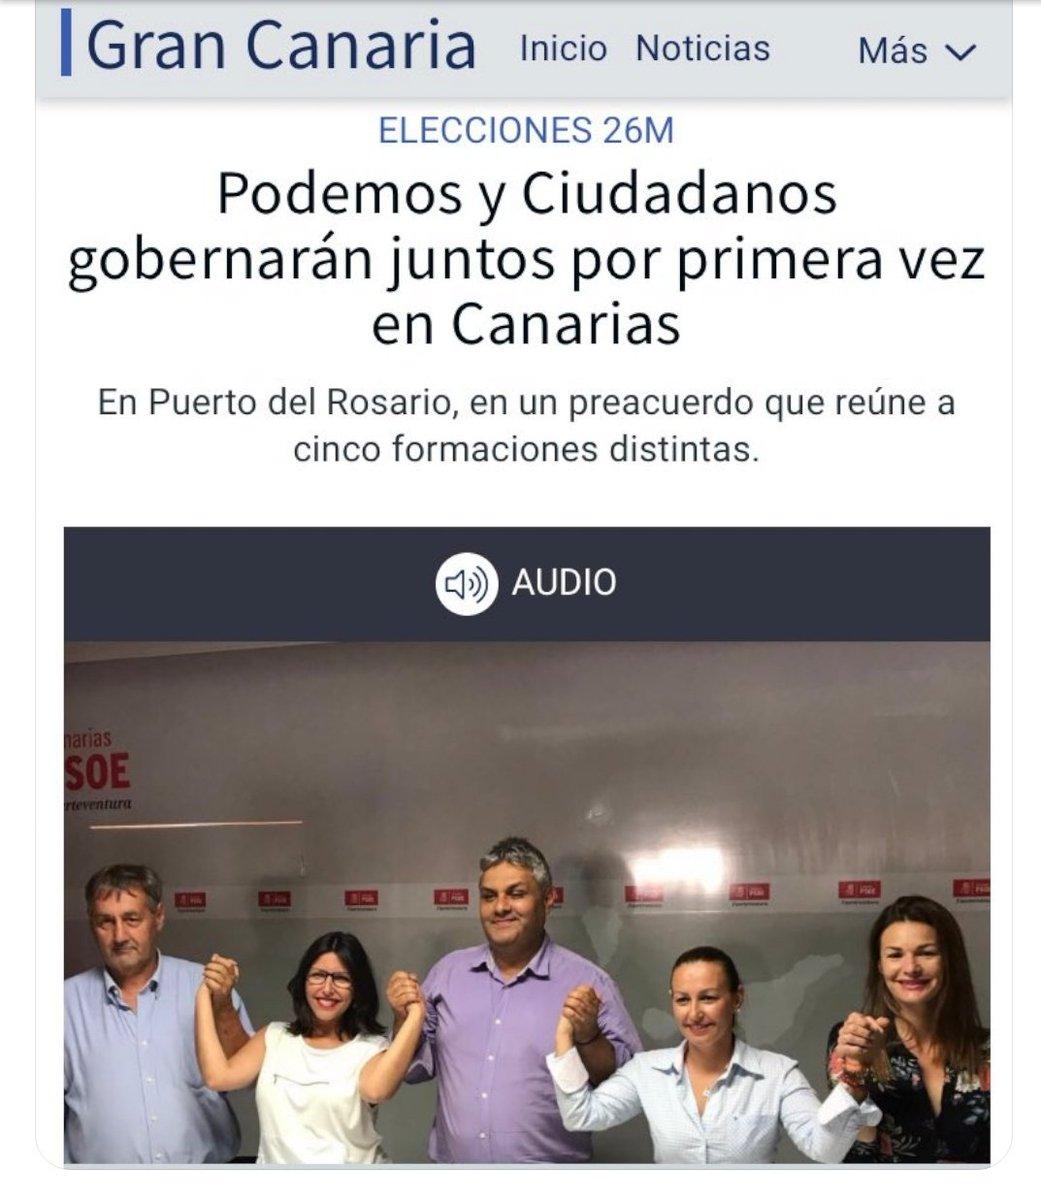 @IdiazAyuso No te fies. #Cs ya pacta con #podemos https://t.co/oEJUL6s6Qm